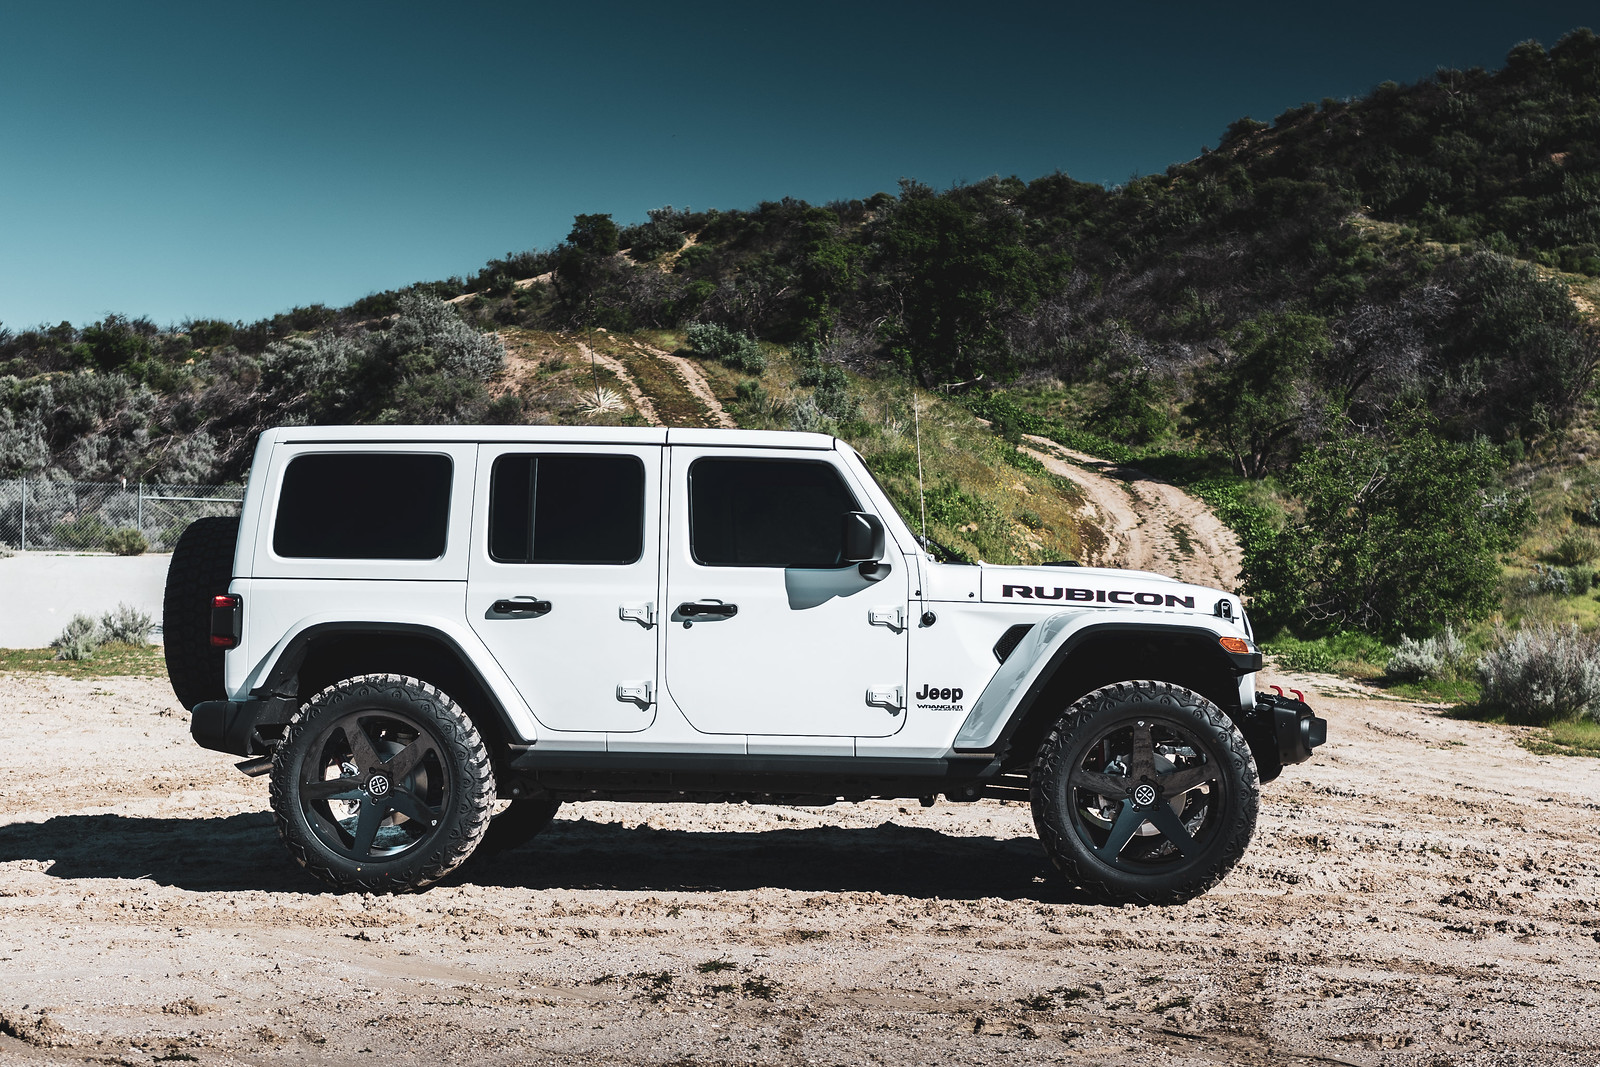 Jeep_Wrangler_BD15_GlossBlack-8